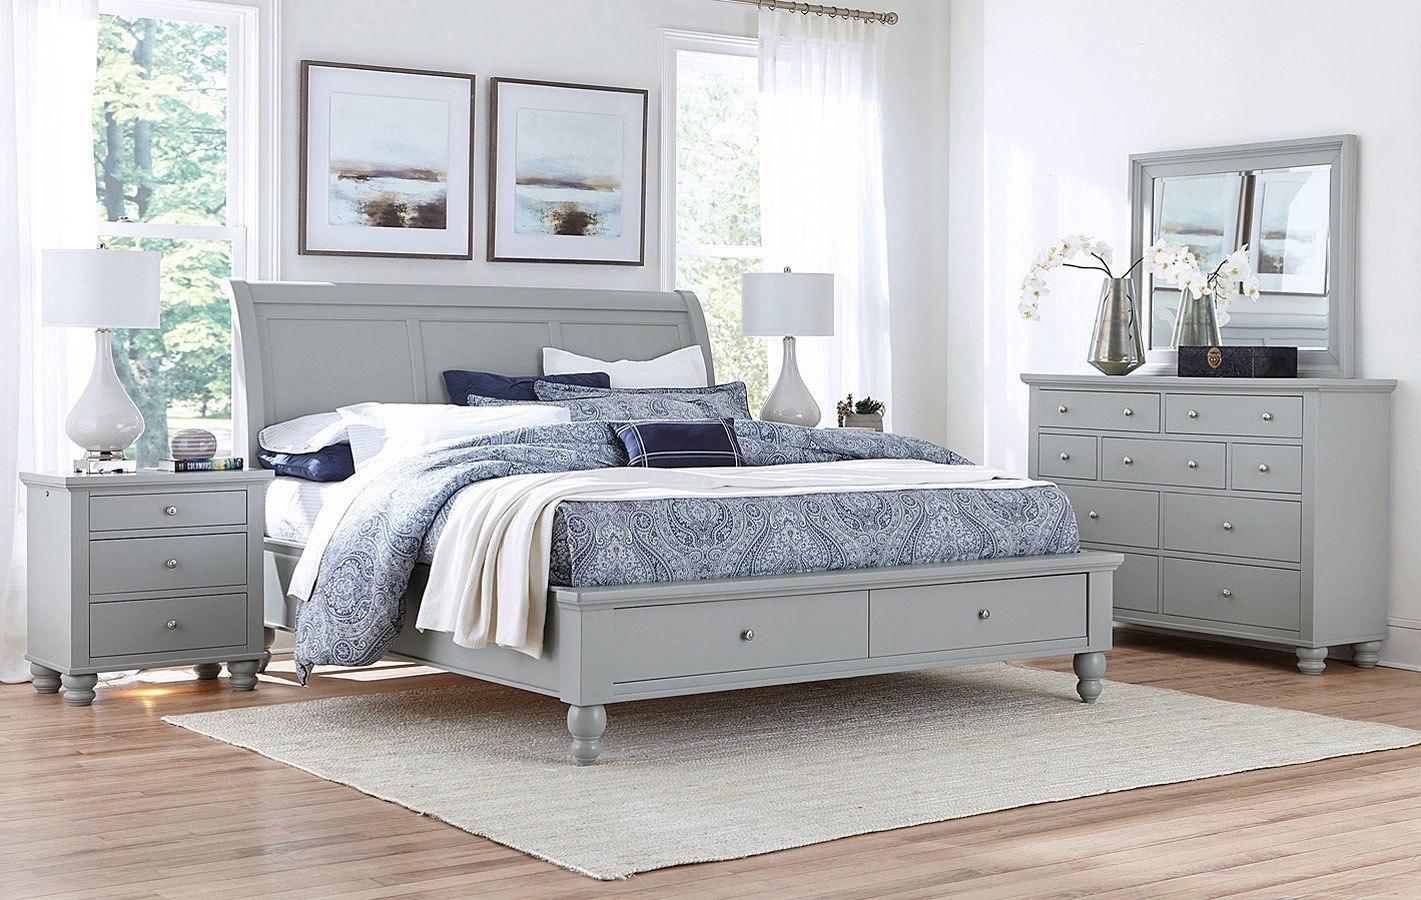 Cambridge Sleigh Storage Bedroom Set Light Gray Paint Aspenhome Furniture Cart